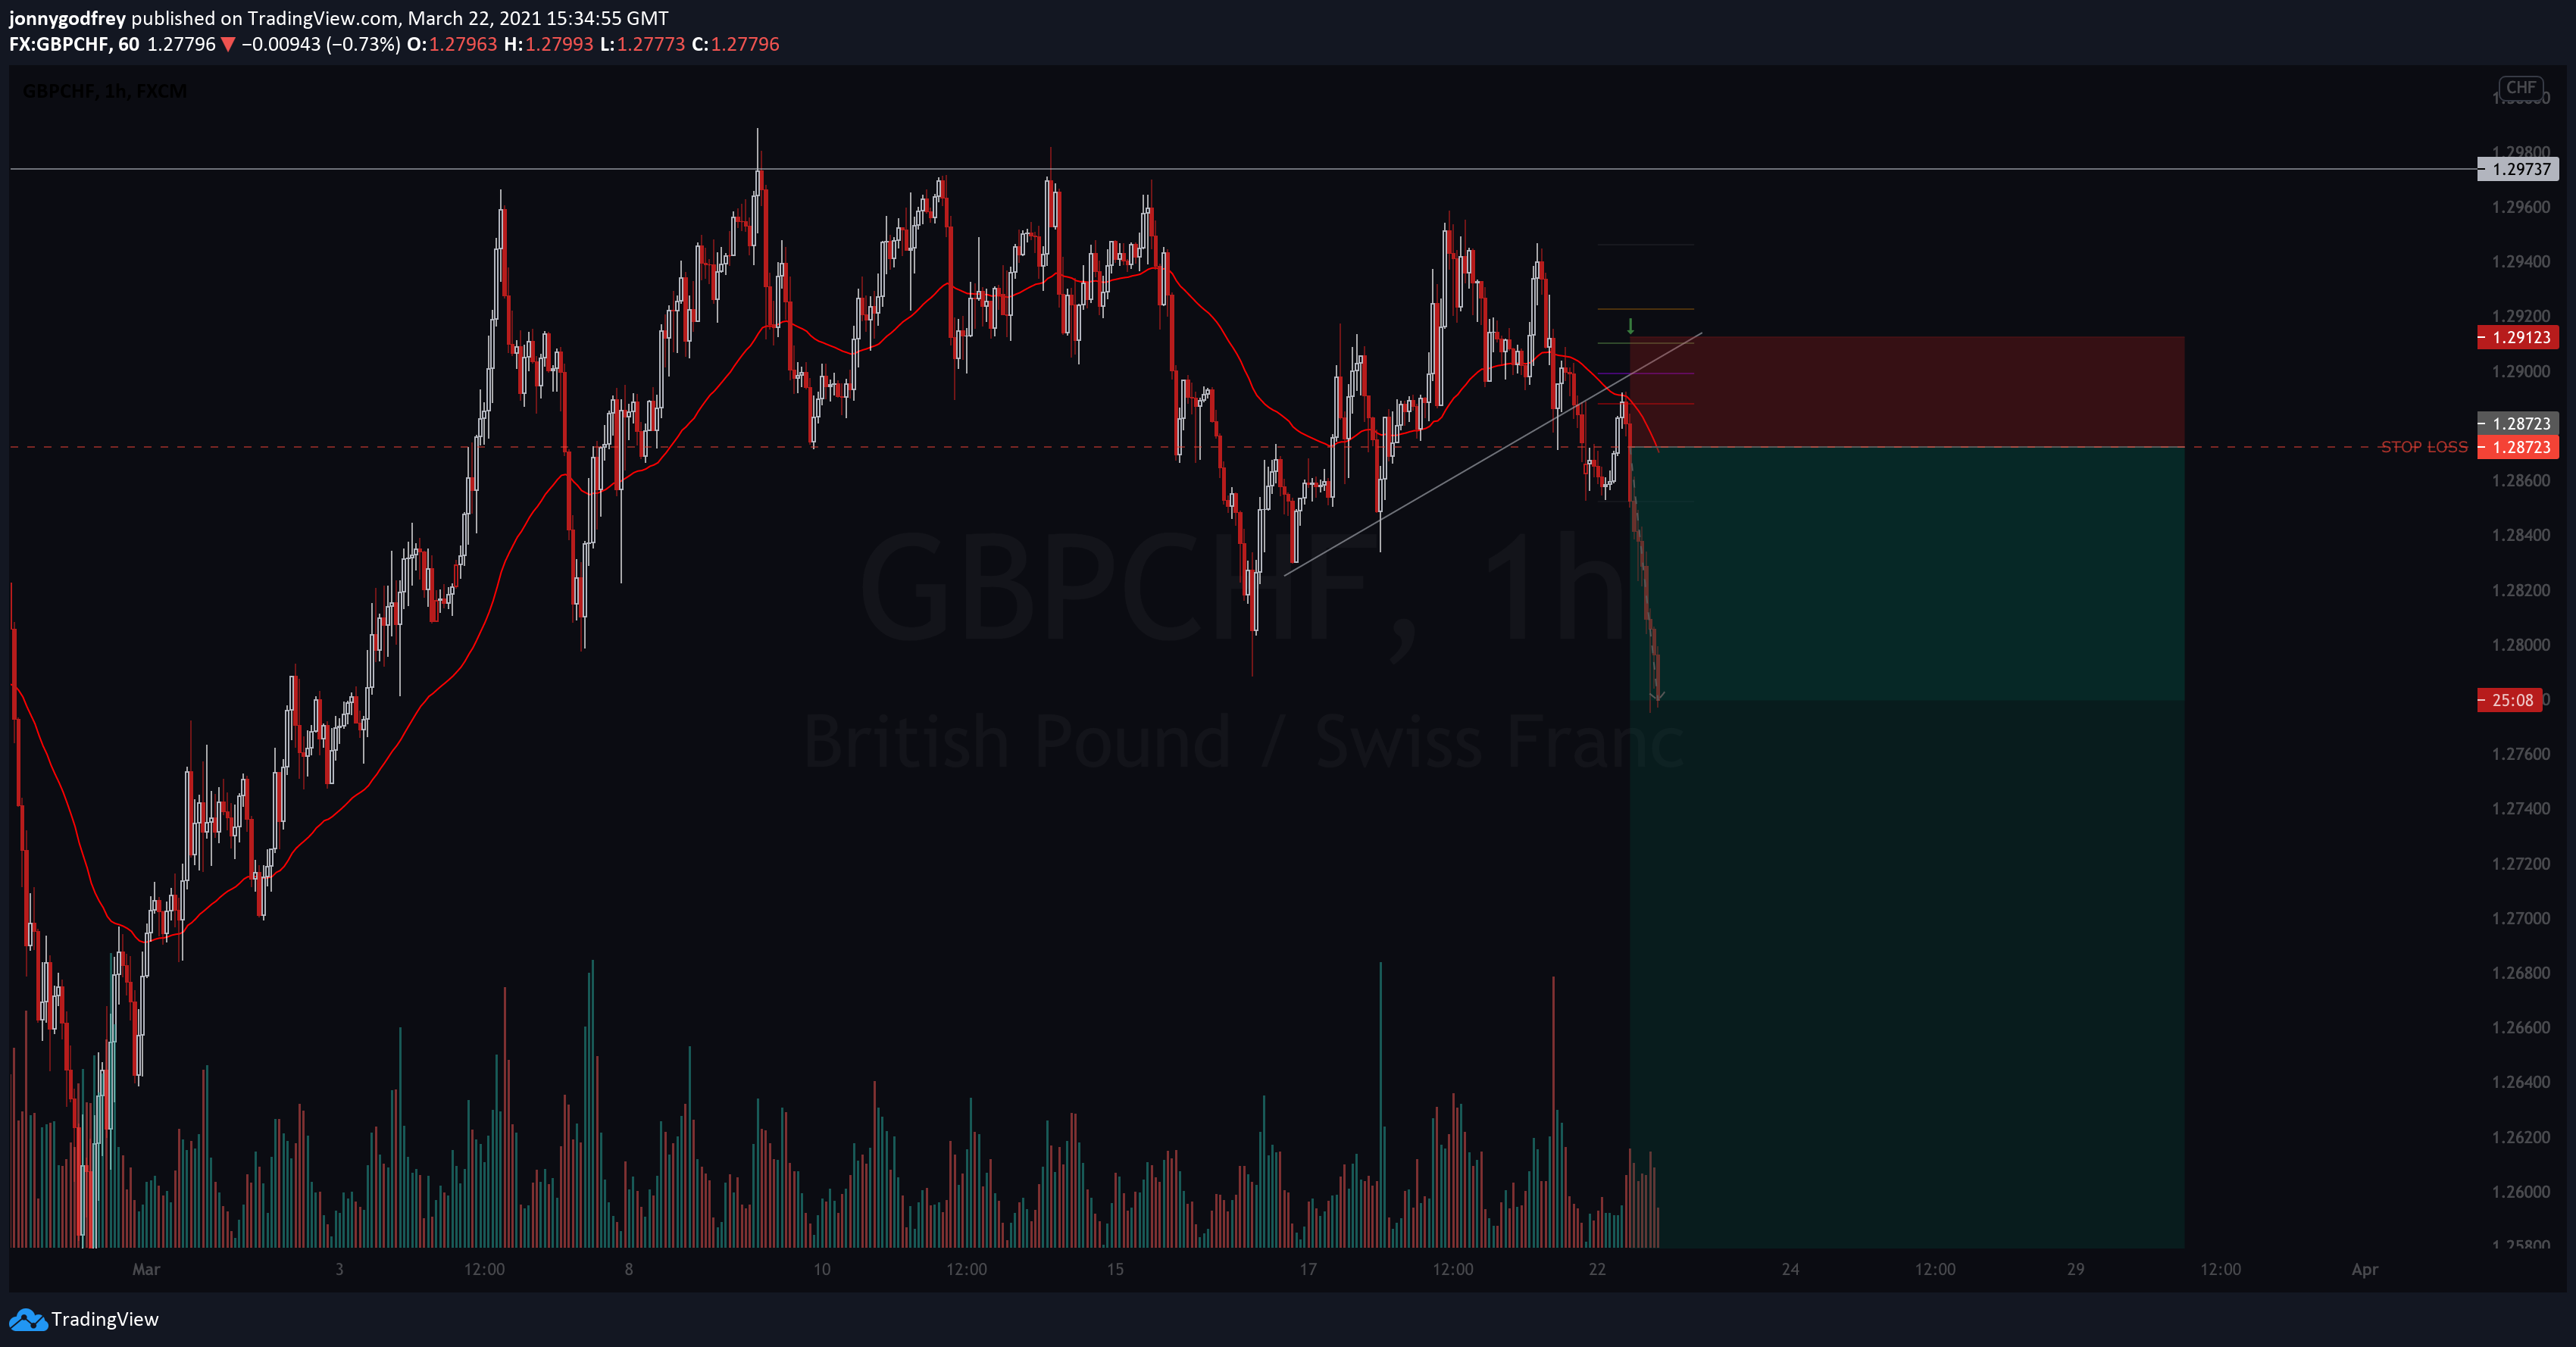 GBPCHF 1 hour chart